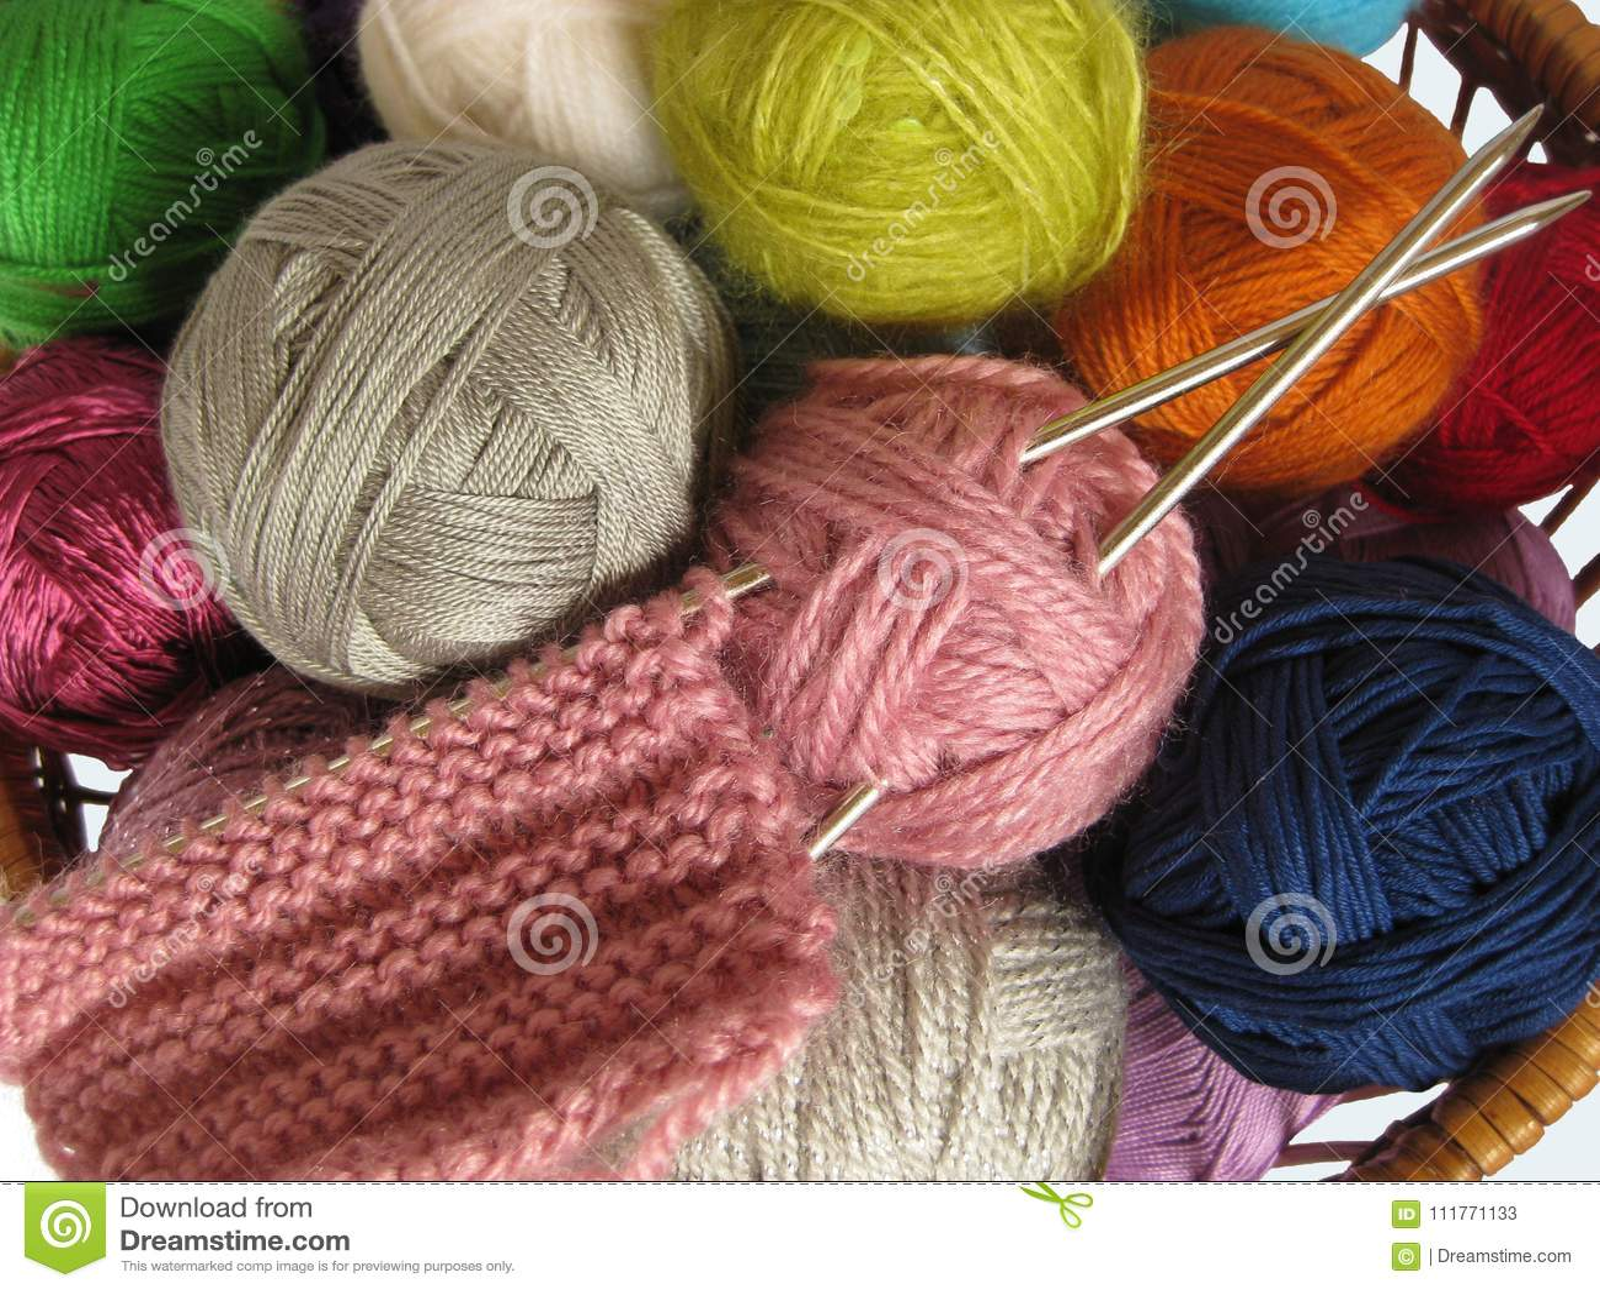 Basket for needlework 96